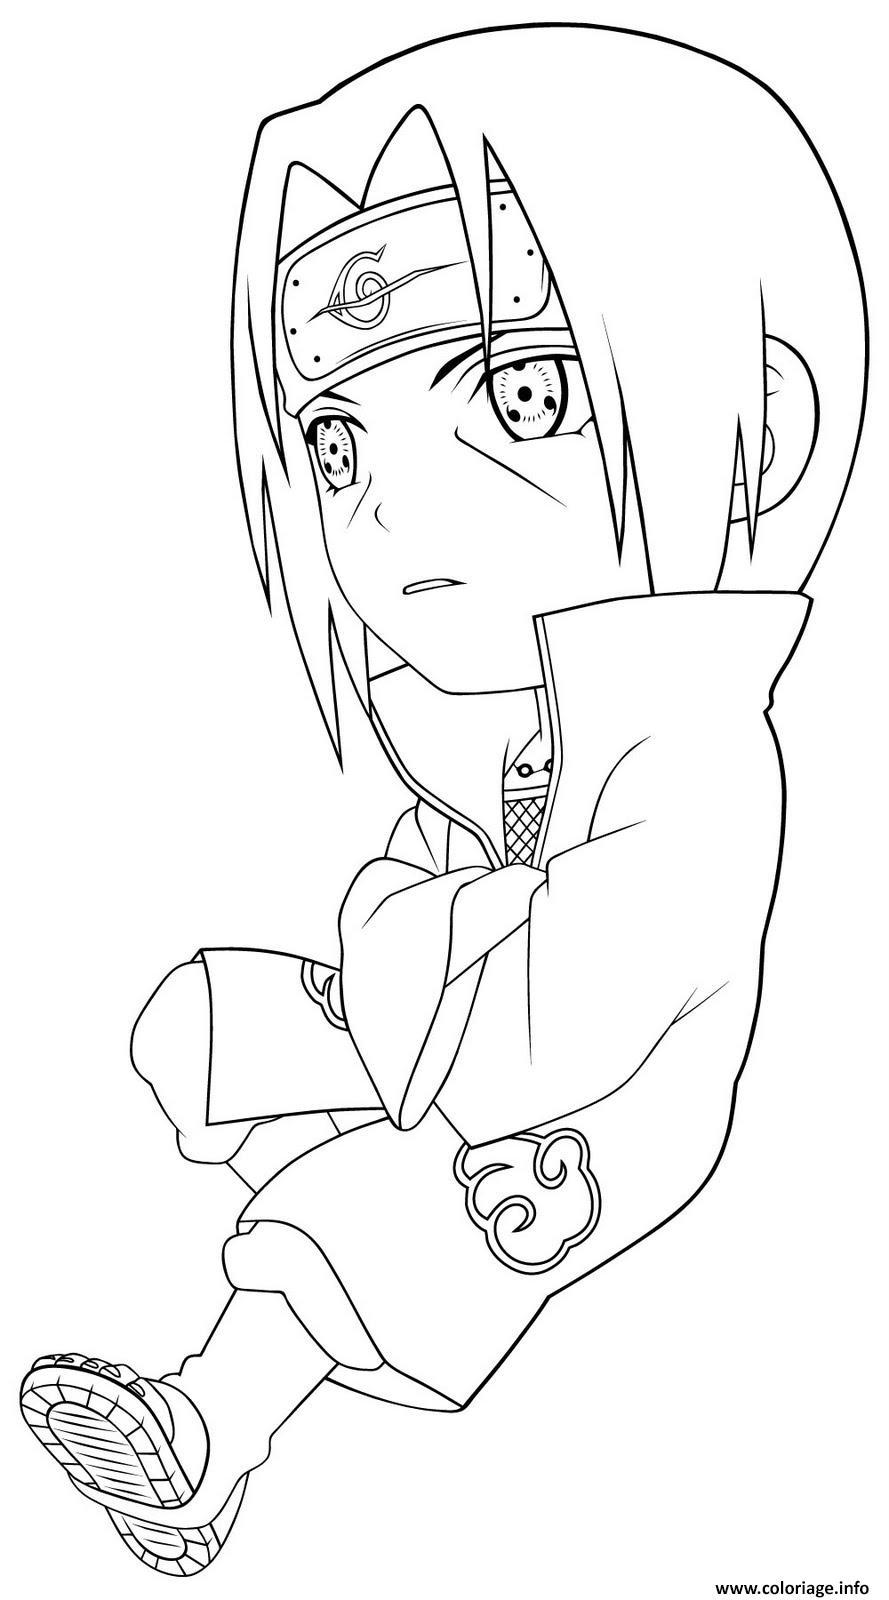 Coloriage manga naruto 34 - Manga dessin a imprimer ...